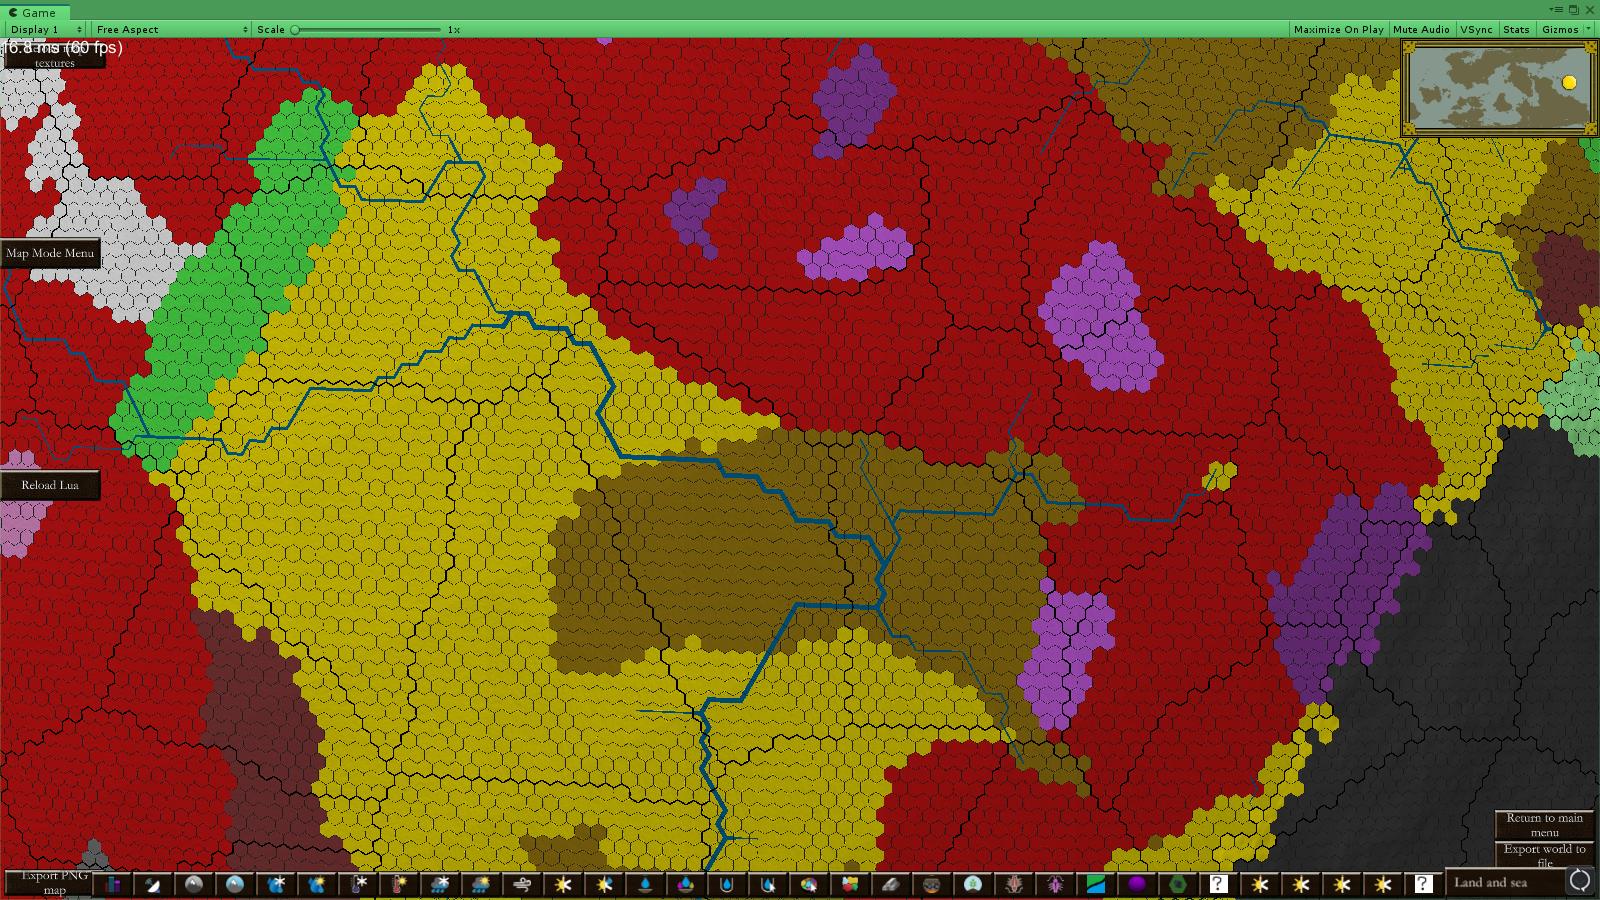 Bedrock Map mode